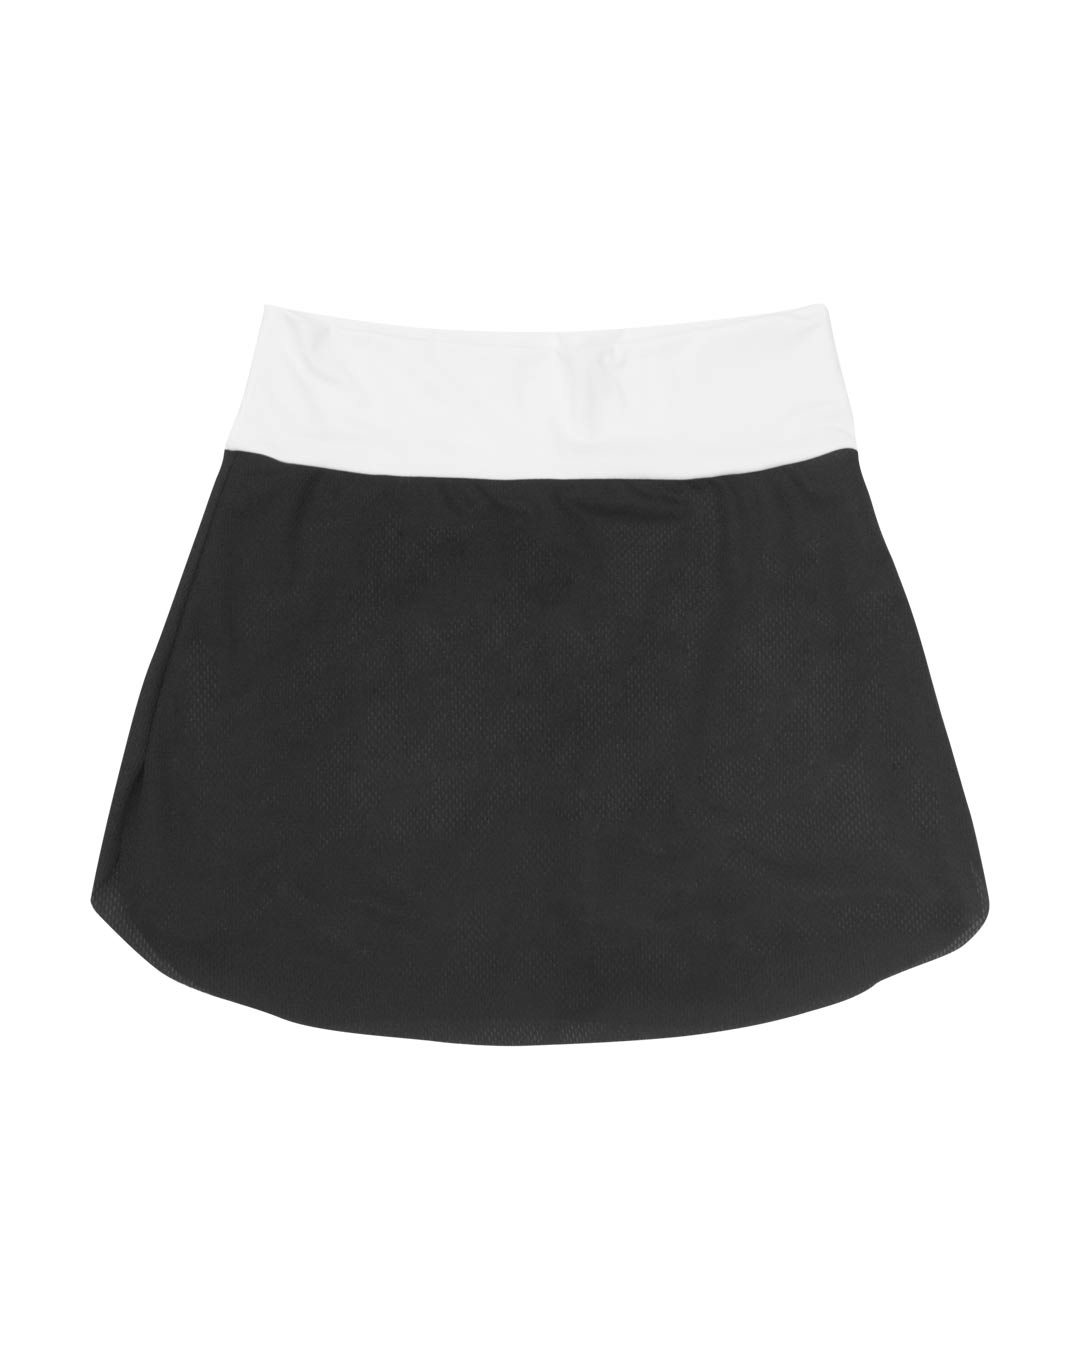 Shorts Saia Fitness Branco Com Tule Preto - Movimente-se